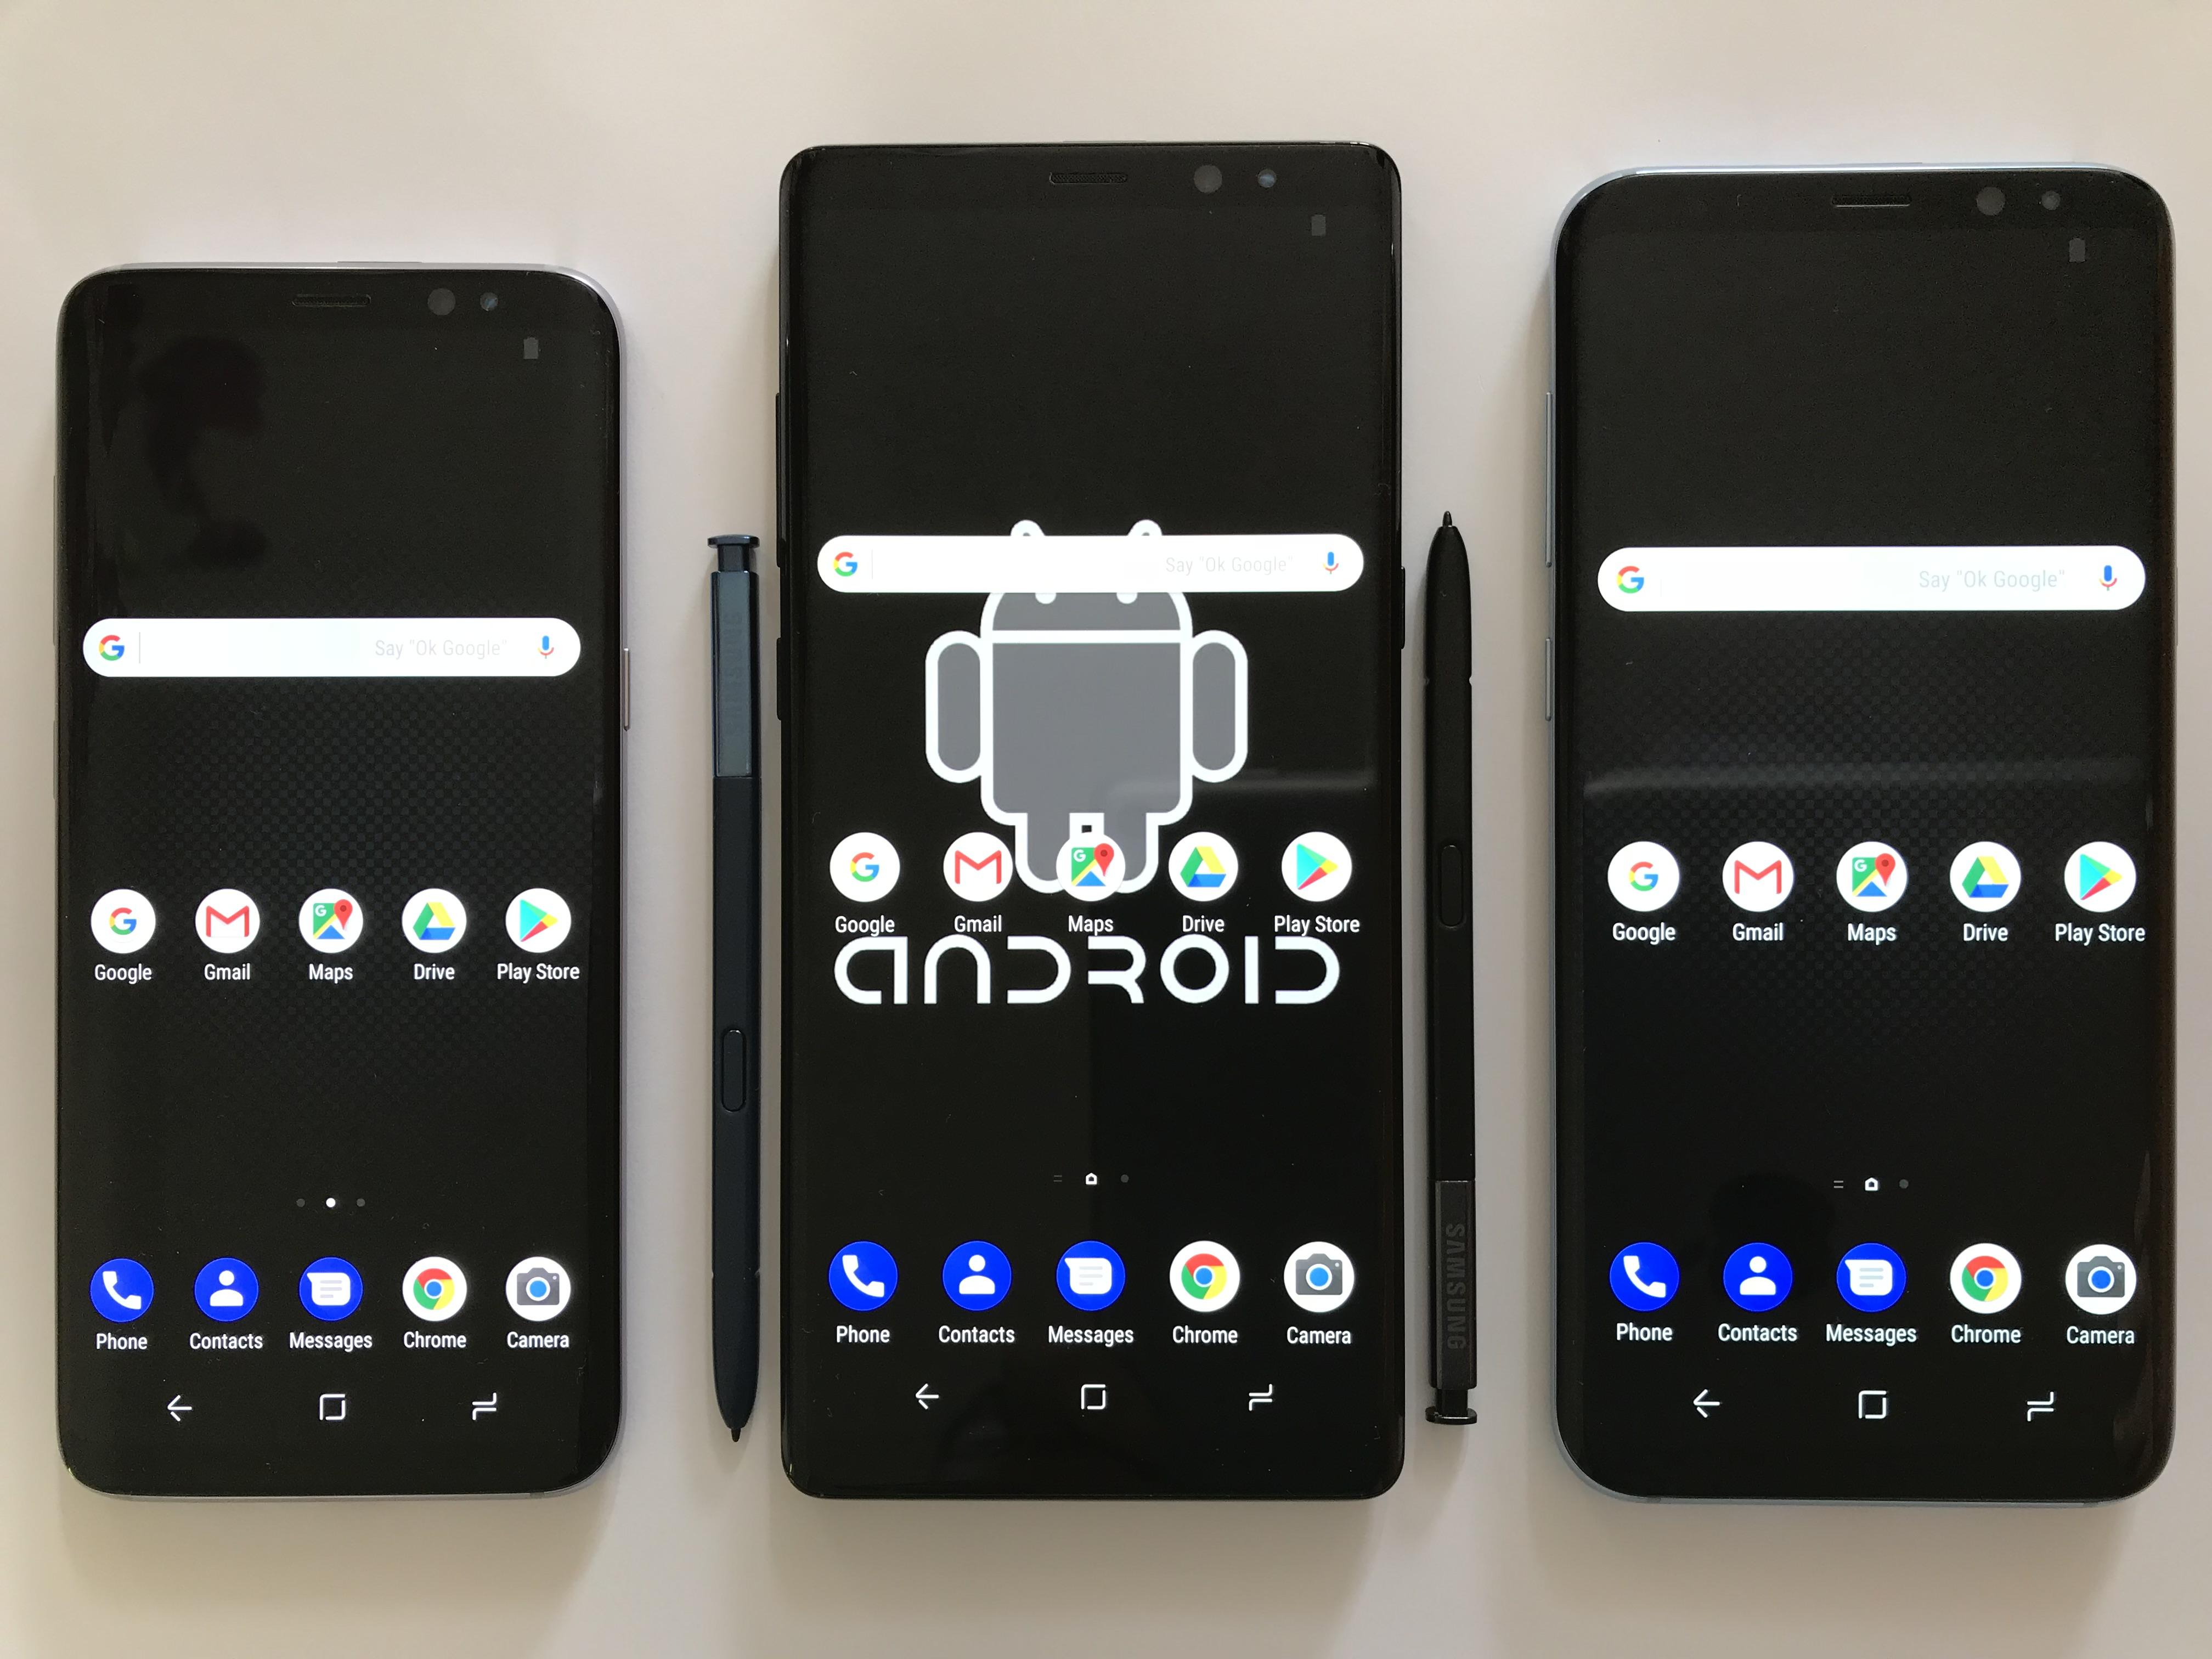 everalsmartphonesrunningooglesndroid